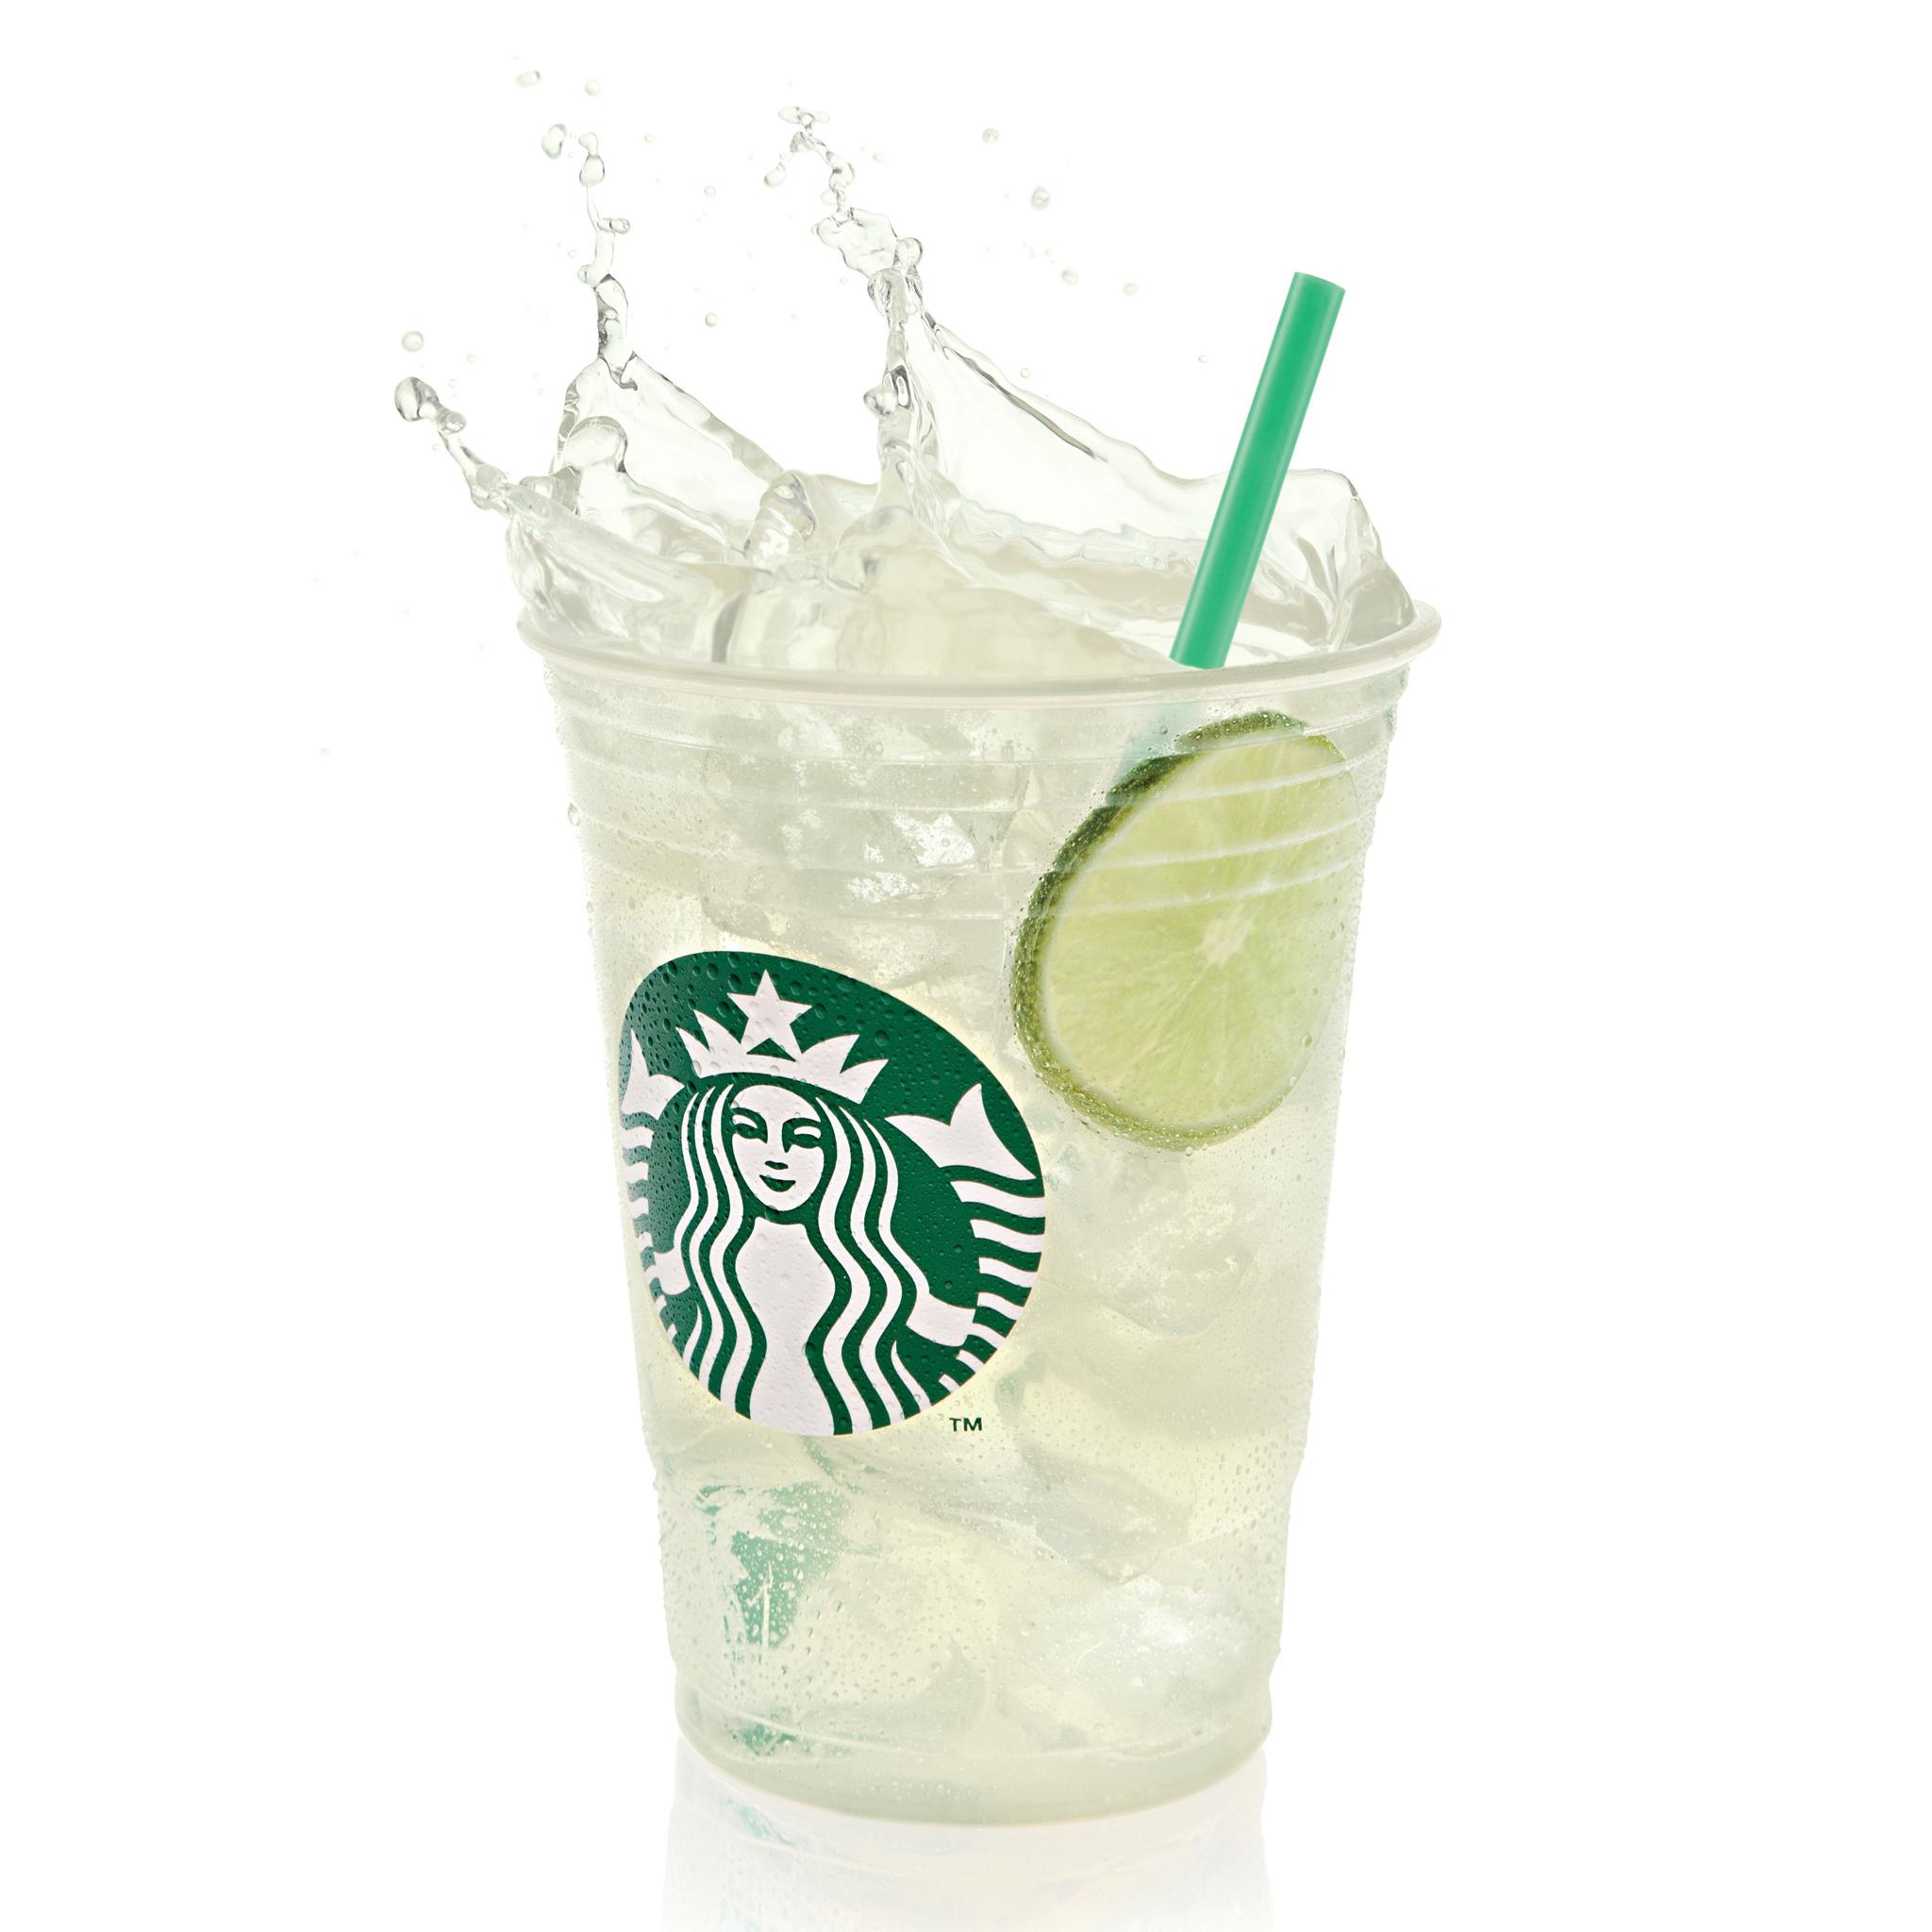 Starbucks Cool Lim 3Wallpapers ipad Retina Starbucks Cool Lim   iPad Retina